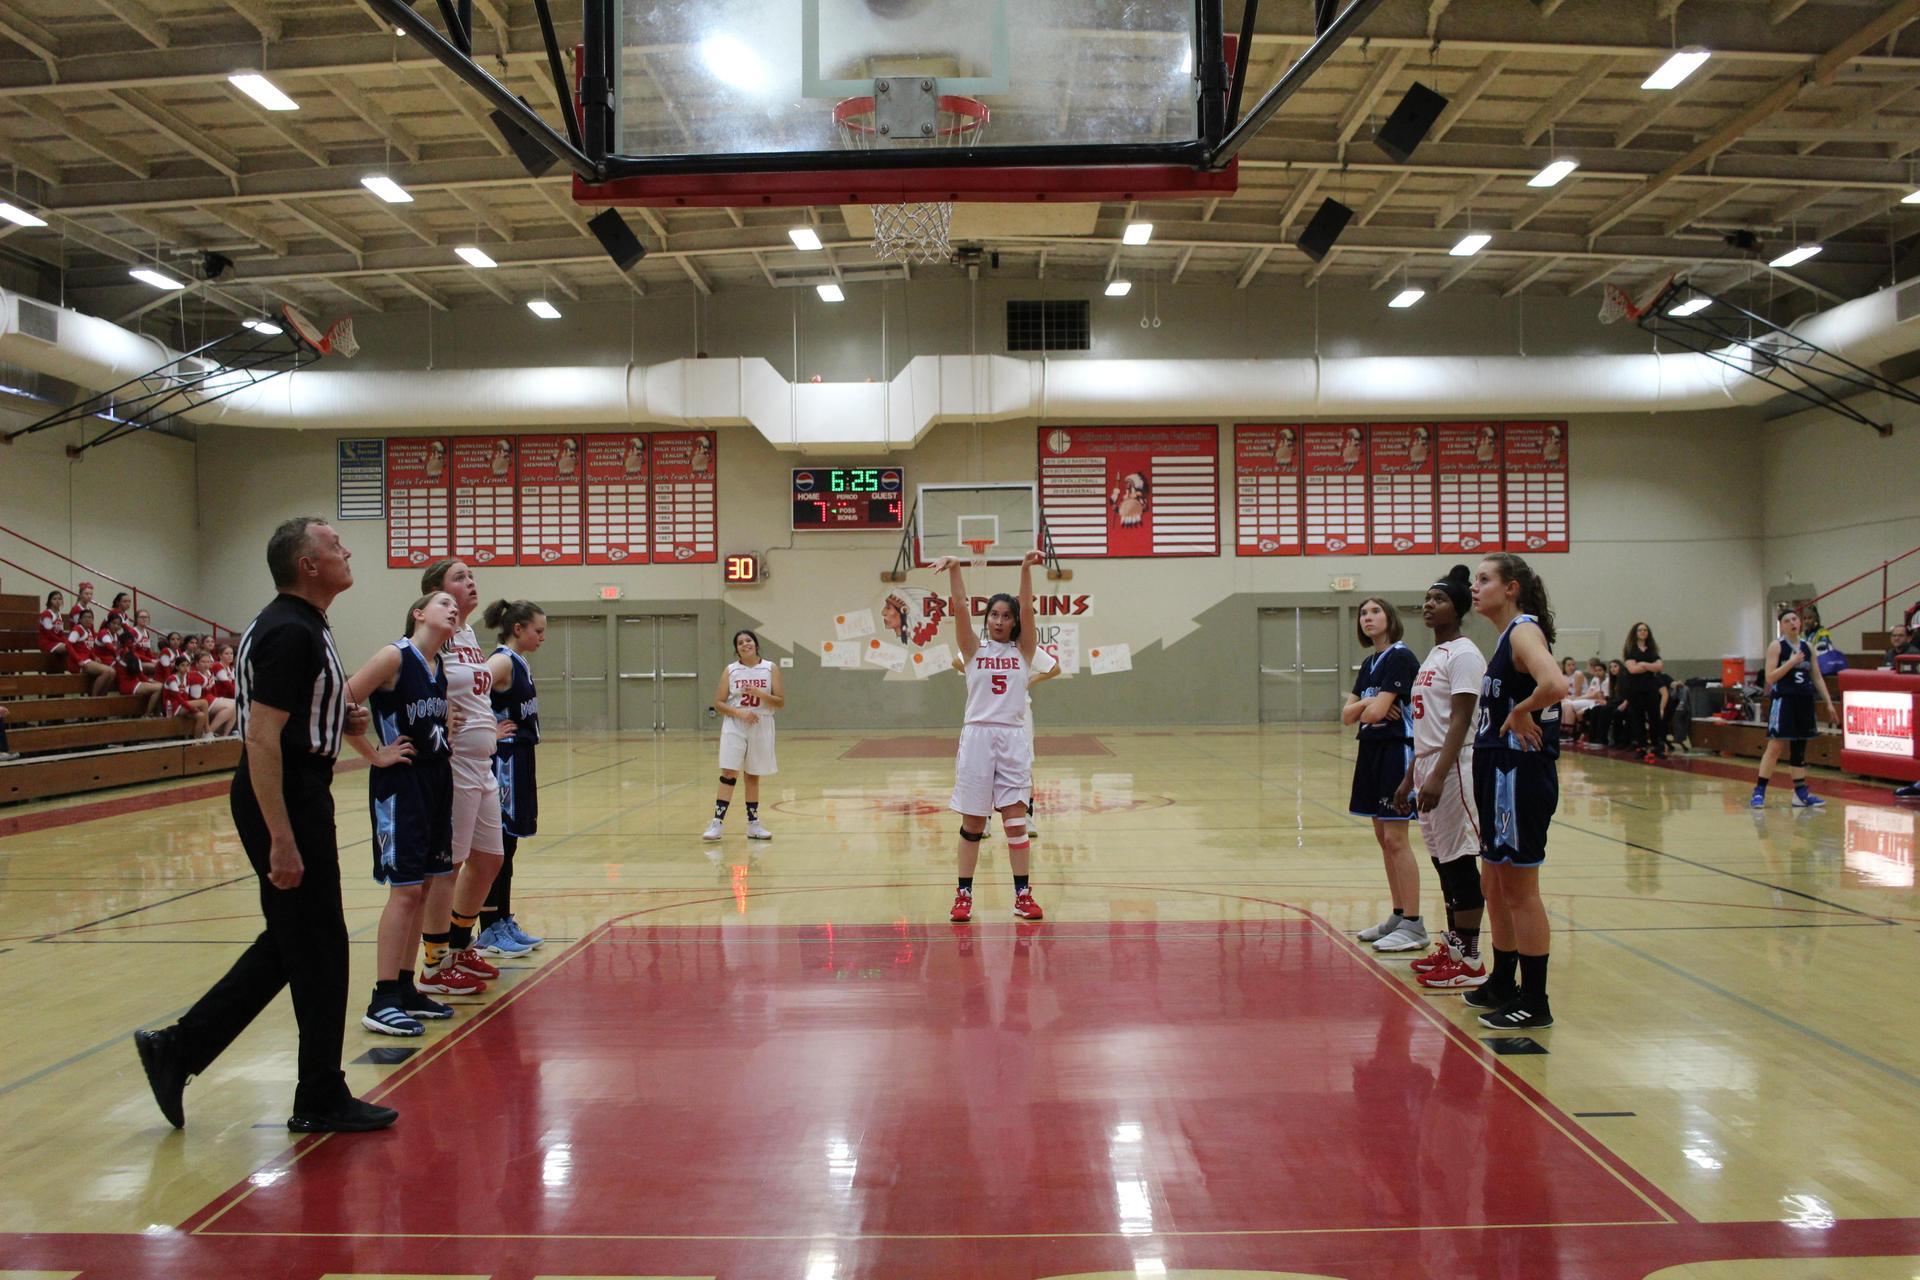 girls playing basketballgirls playing basketball